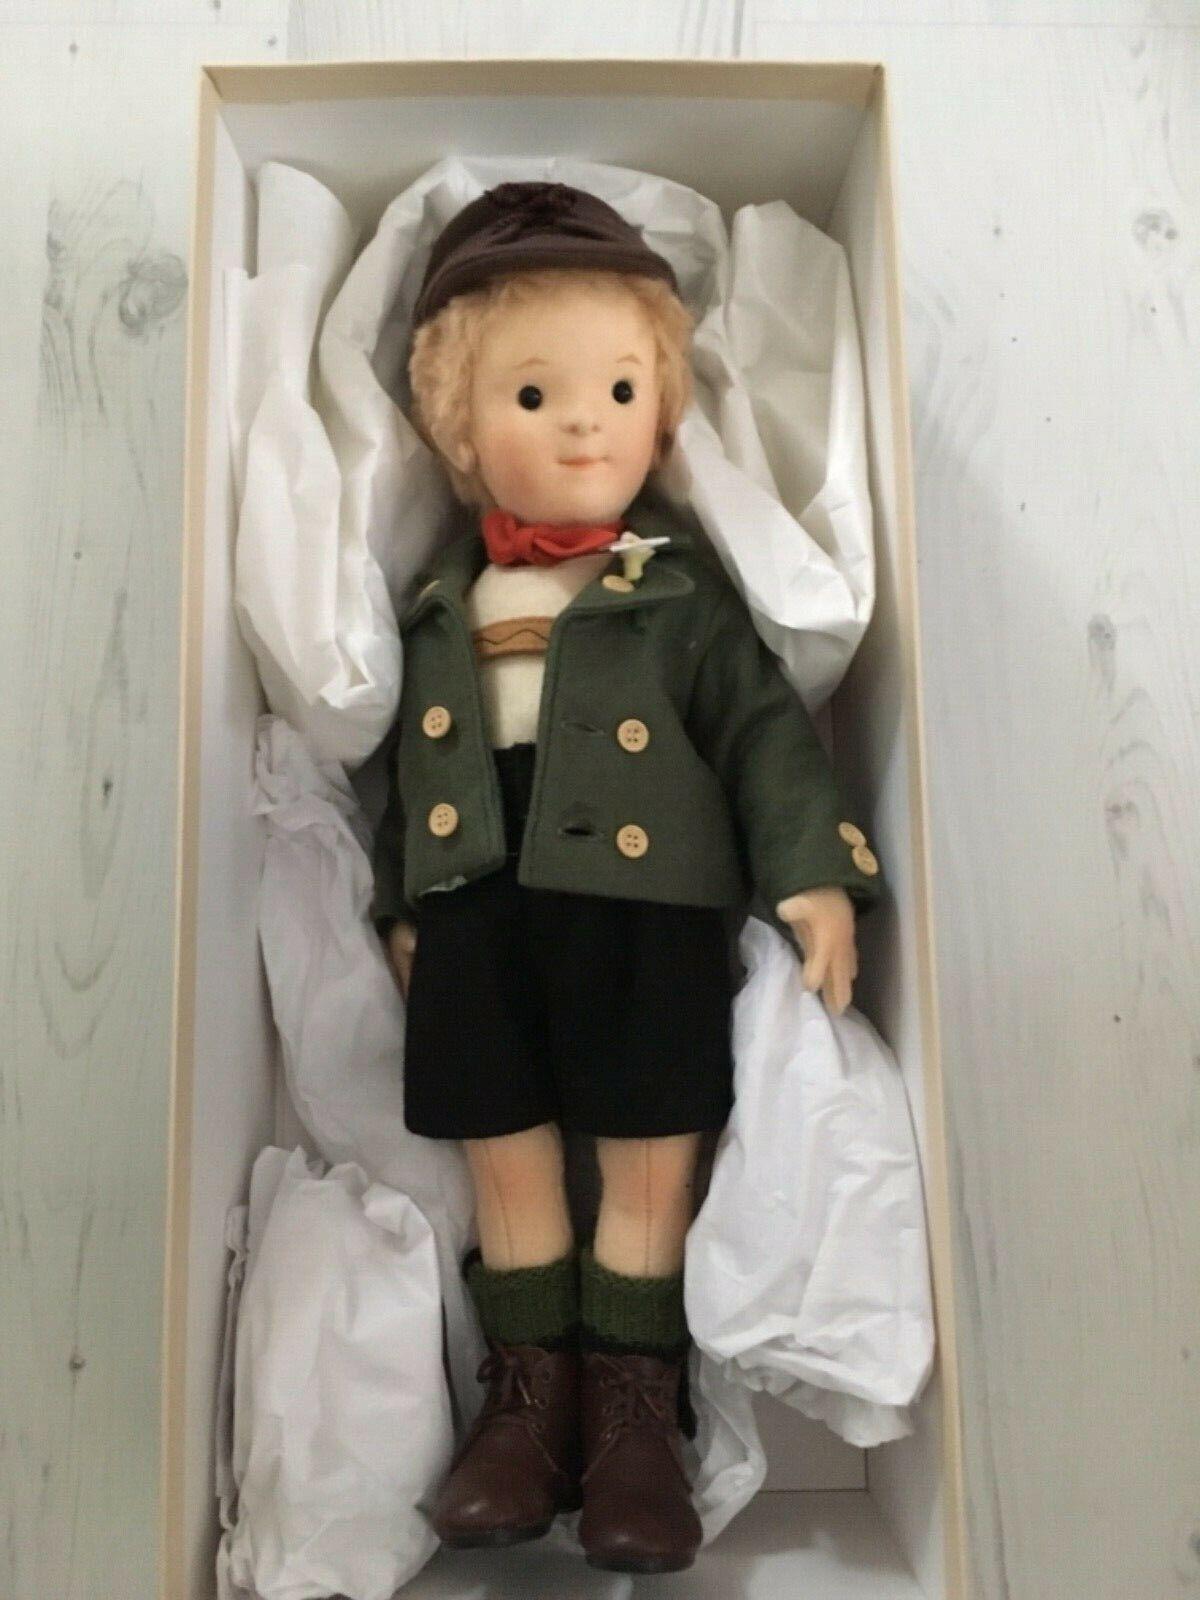 Steiff KINDER R. John Wright Lukas edizione limitata bambole feltro SERIE 246/500